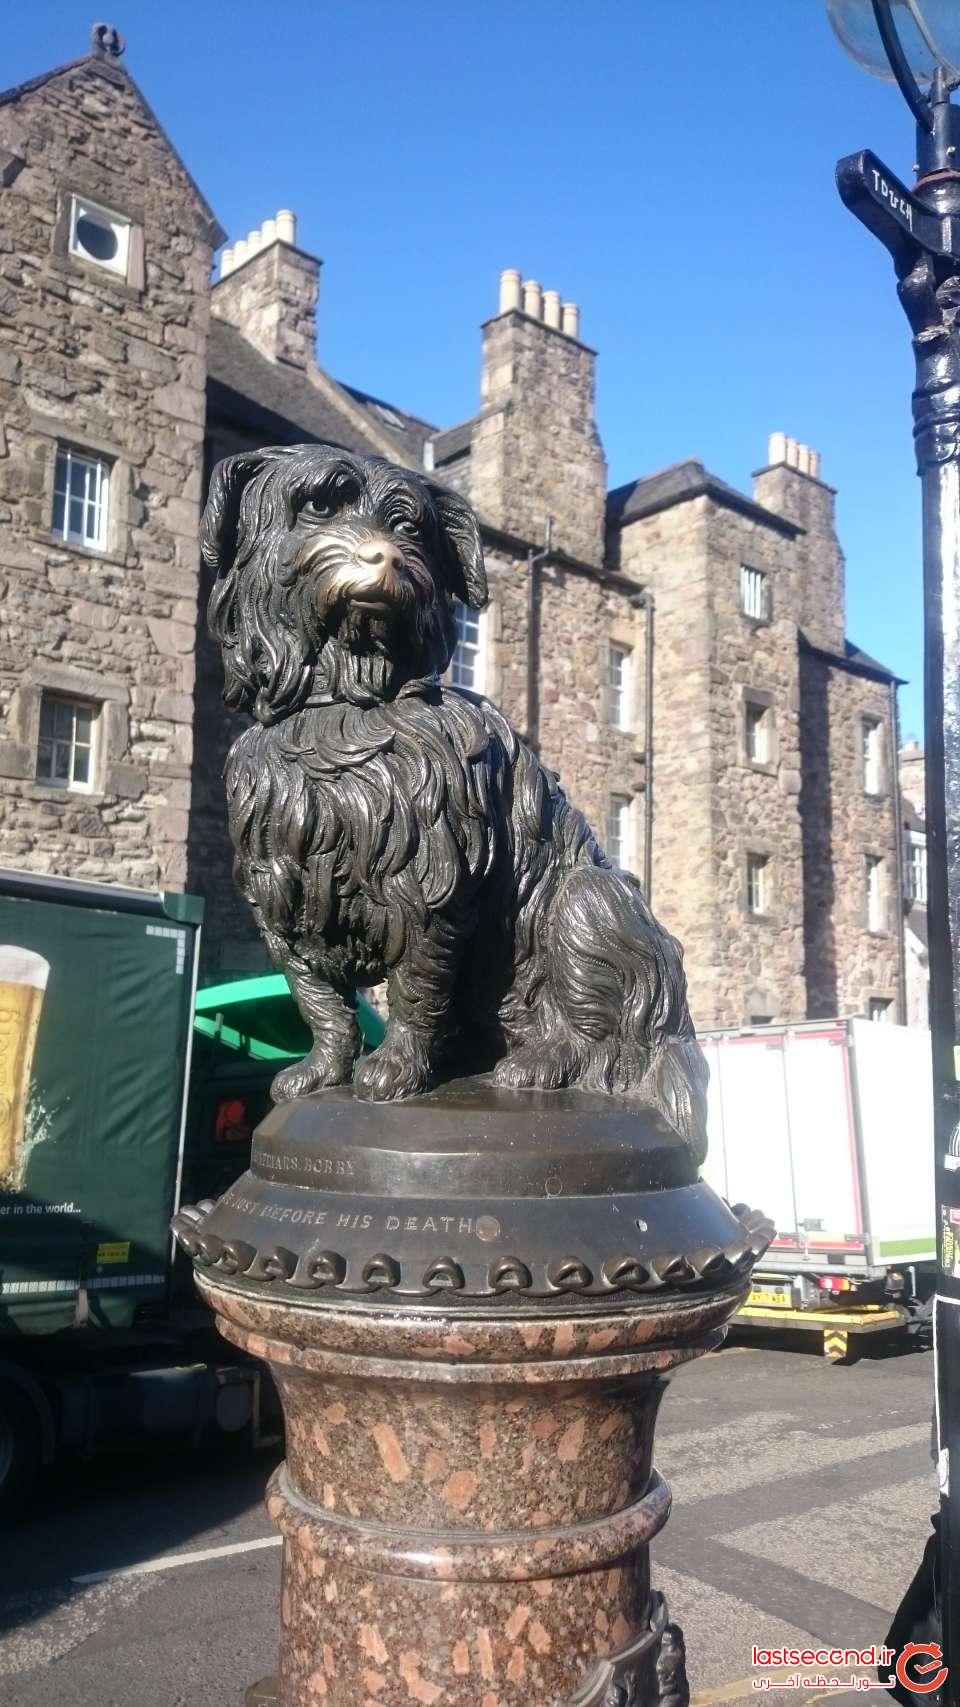 Edinburgh - سفر انگلستان 25شهریور تا 6 مهر 1396 (264).JPG